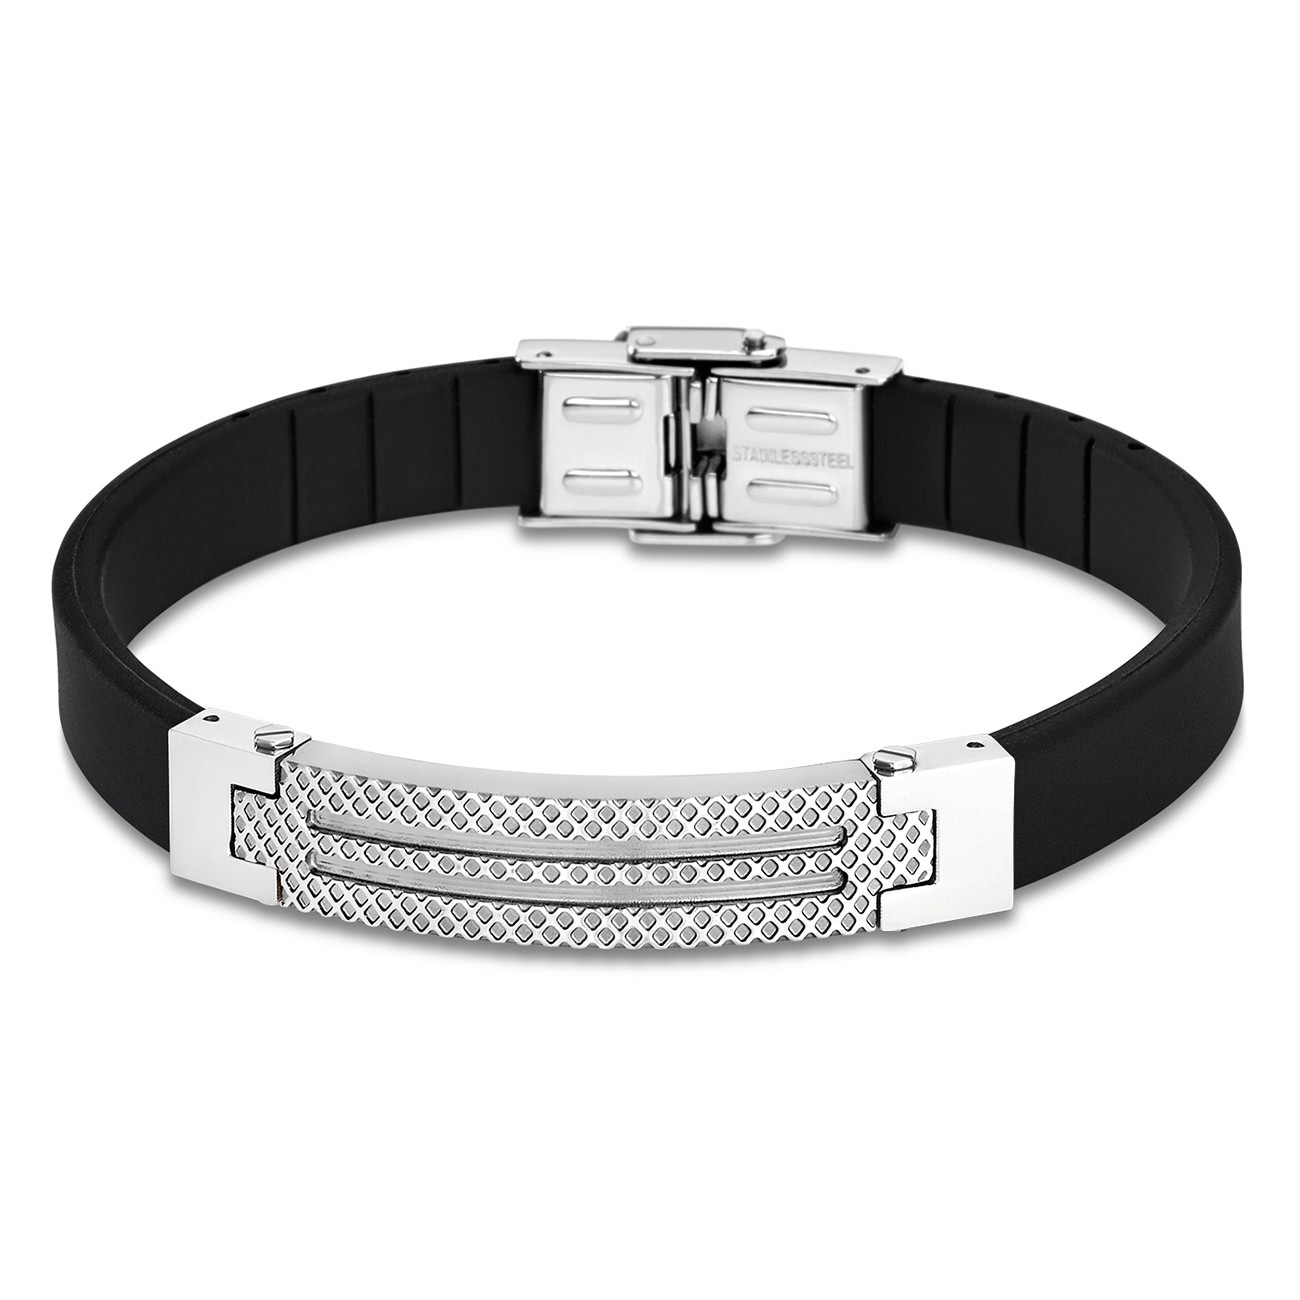 LOTUS Style Armband Herren LS1797-2/1 Edelstahl schwarz silber JLS1797-2-1